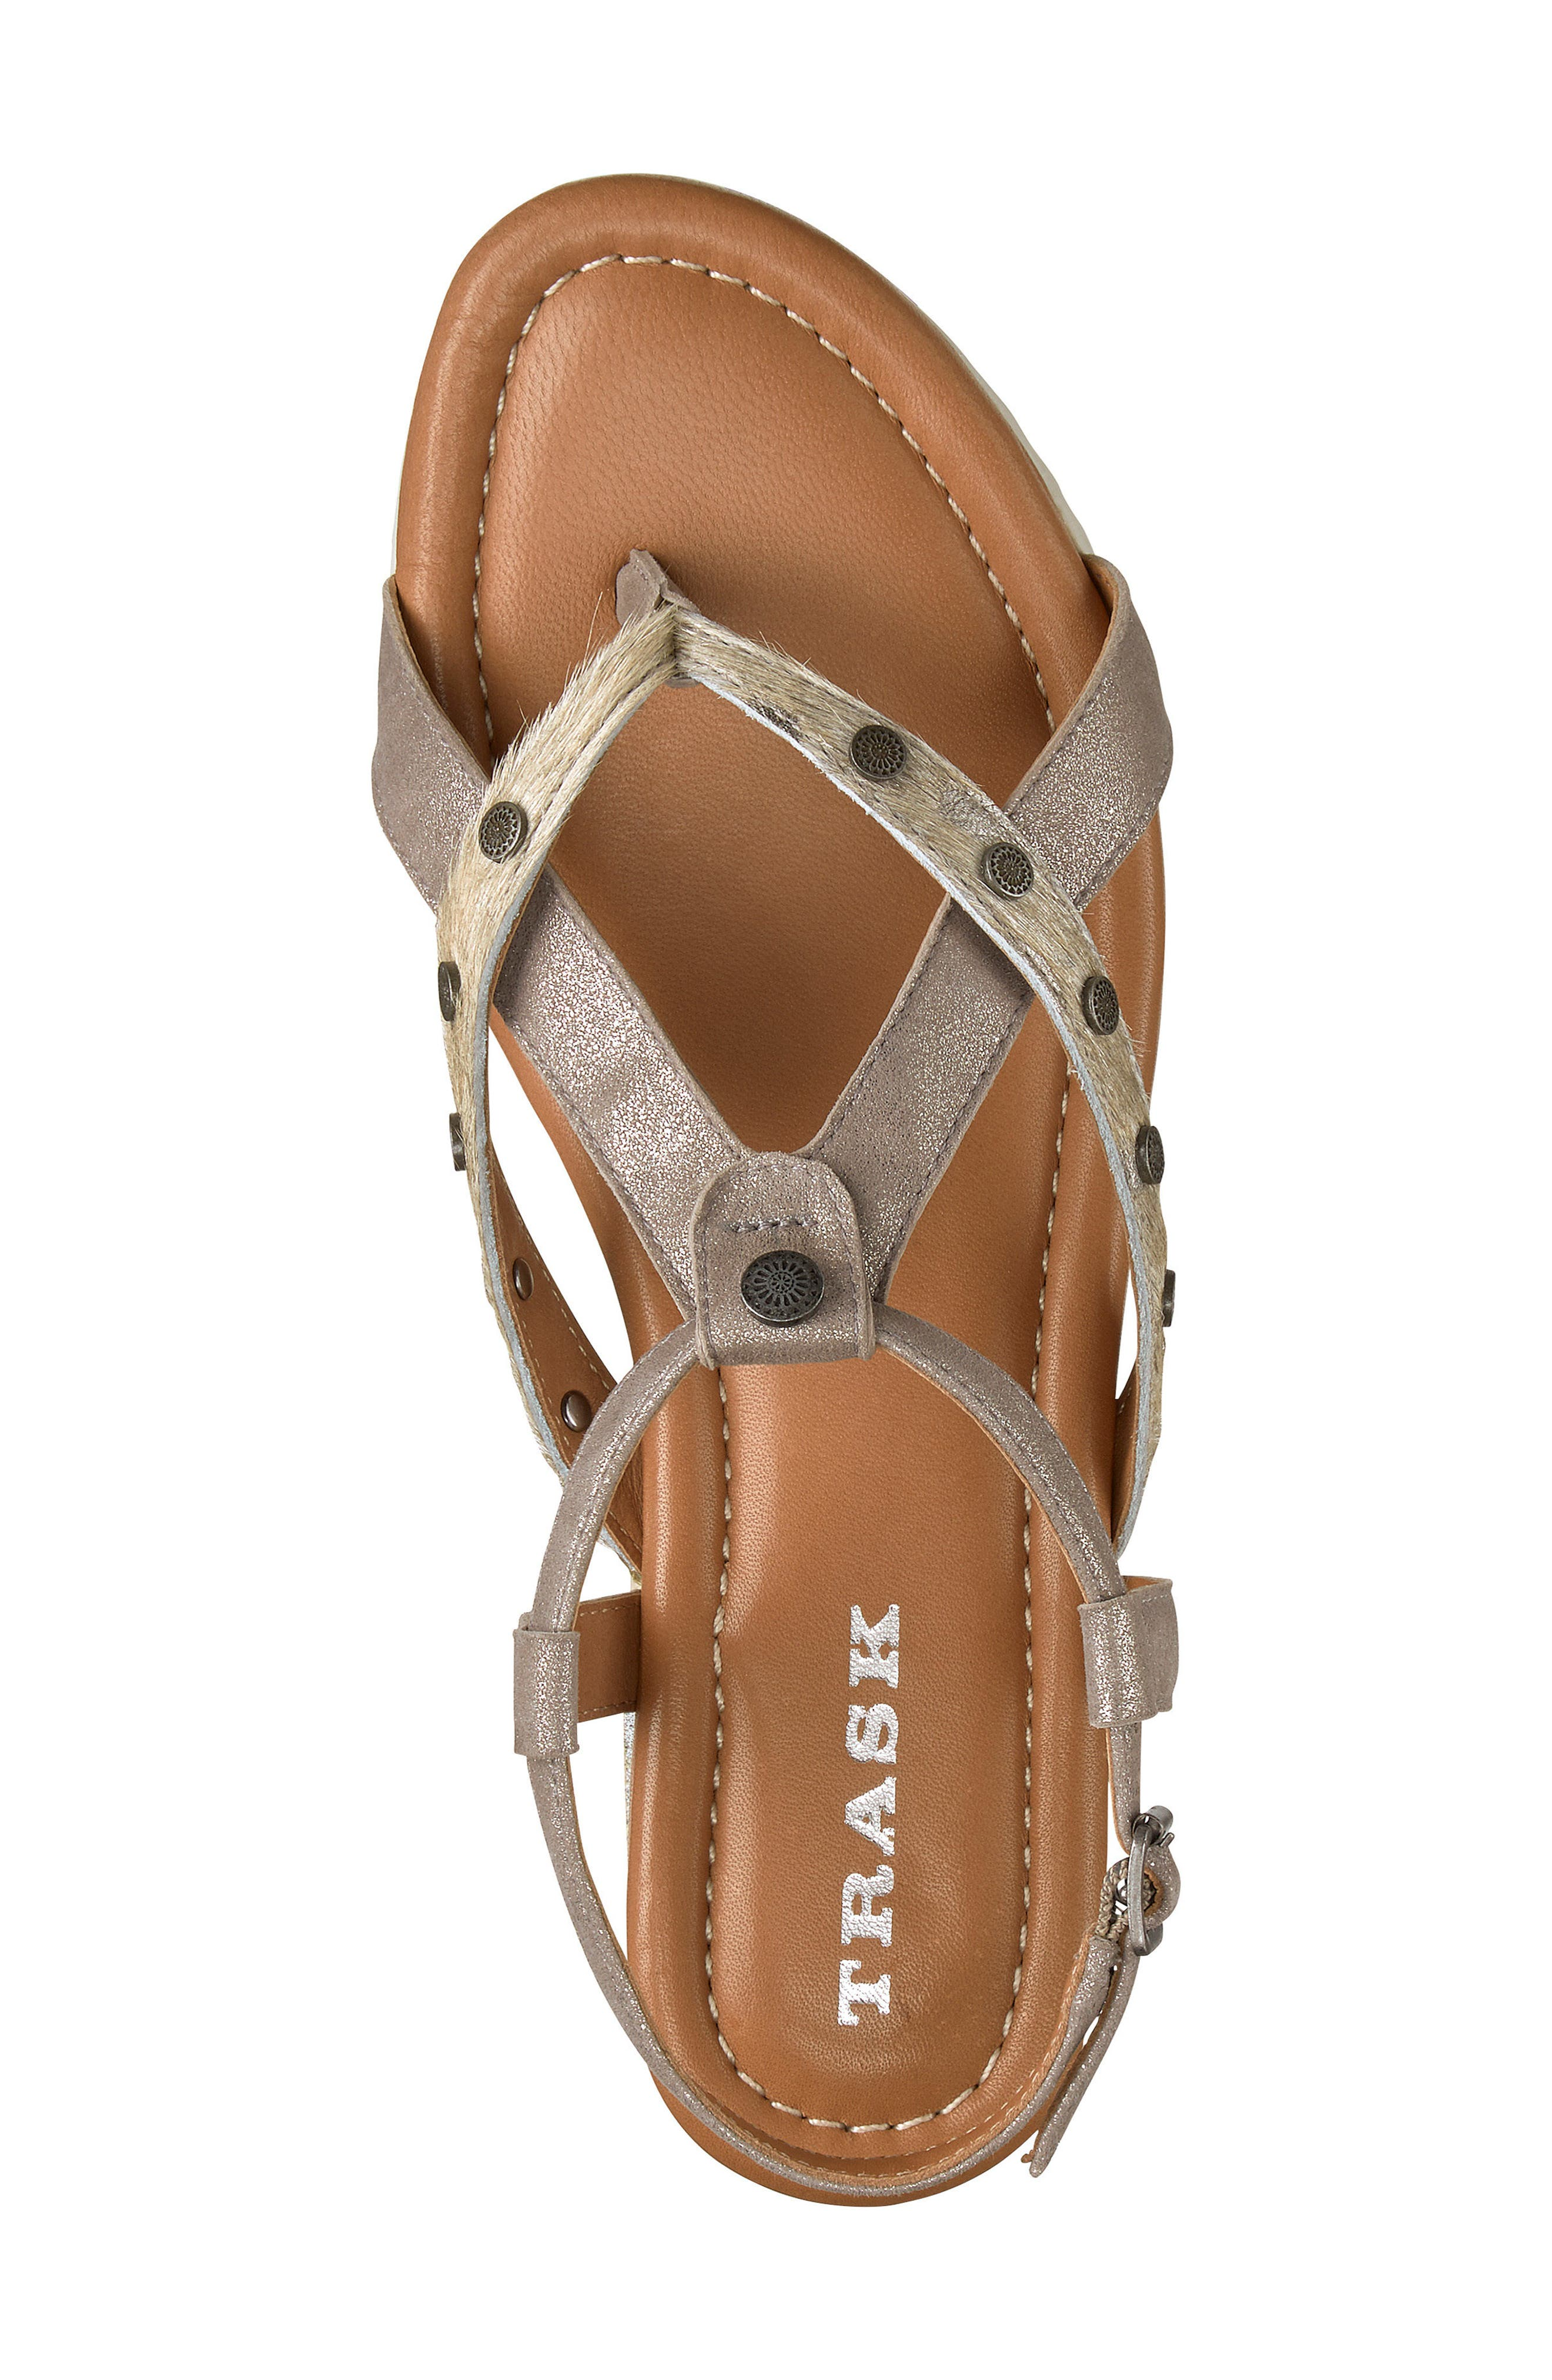 Shayla Water Resistant Sandal,                             Alternate thumbnail 5, color,                             PEWTER/ BONE SUEDE